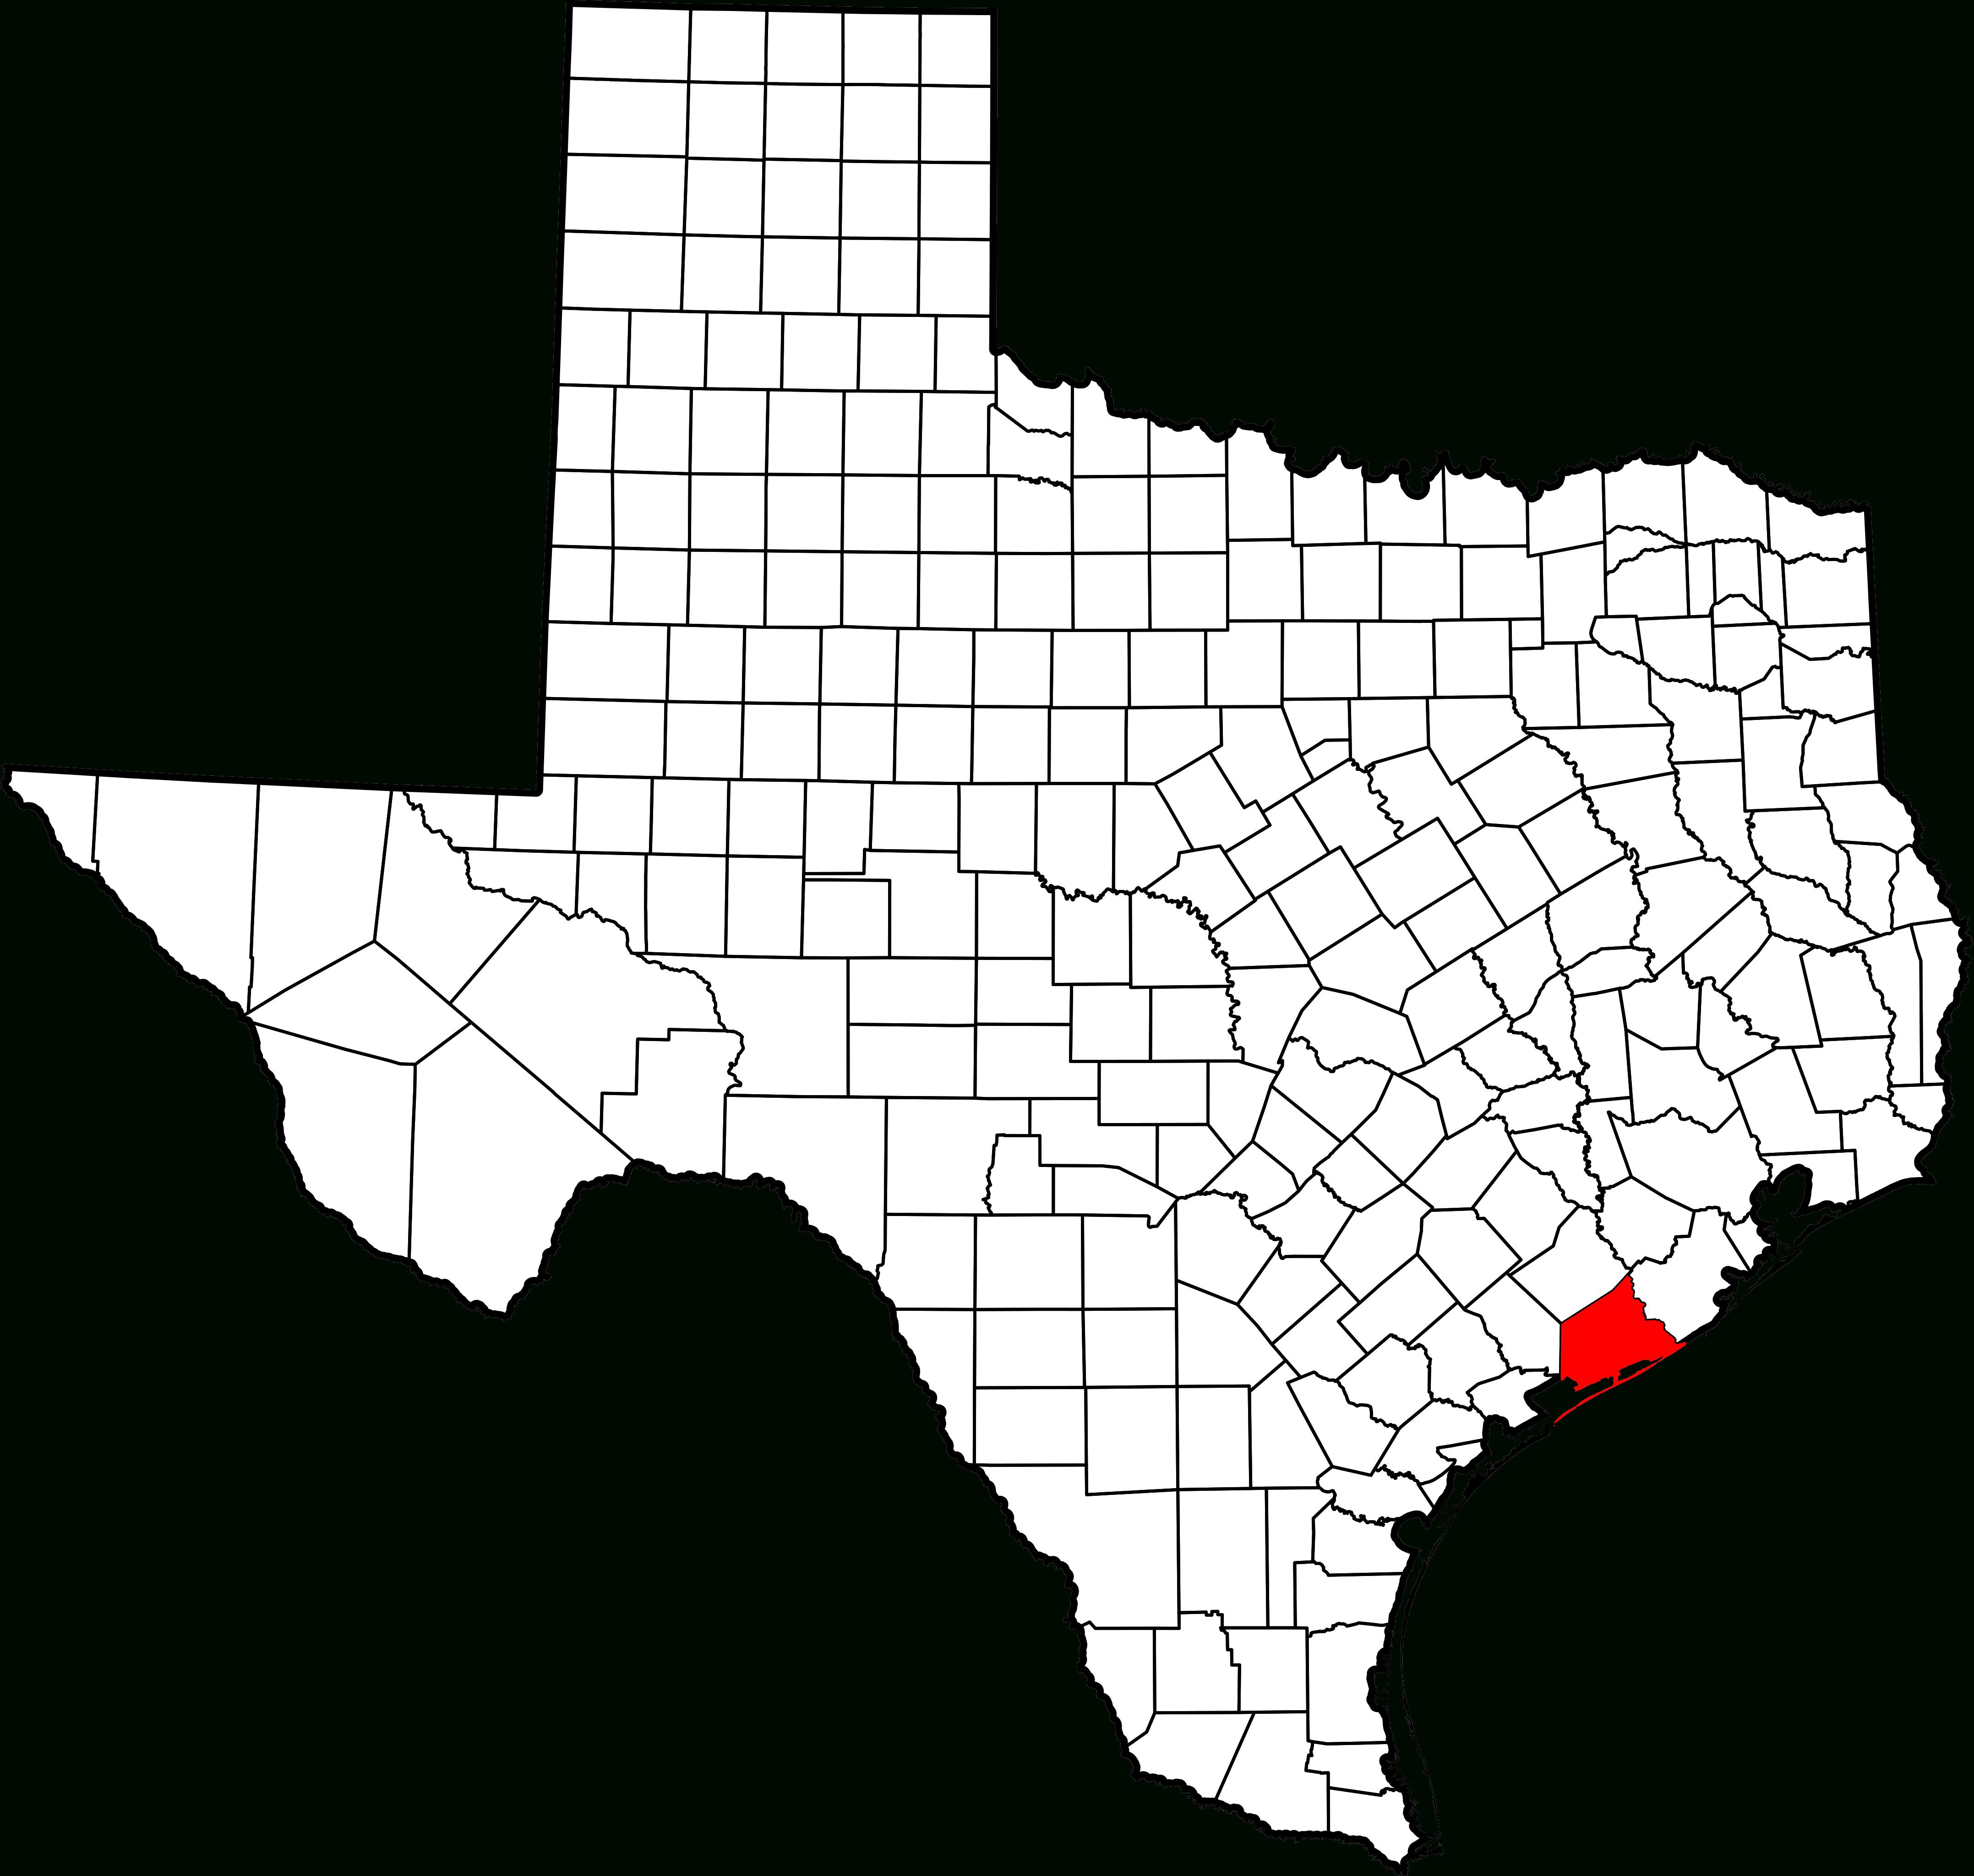 File:map Of Texas Highlighting Matagorda County.svg - Wikimedia Commons - Map Of Matagorda County Texas